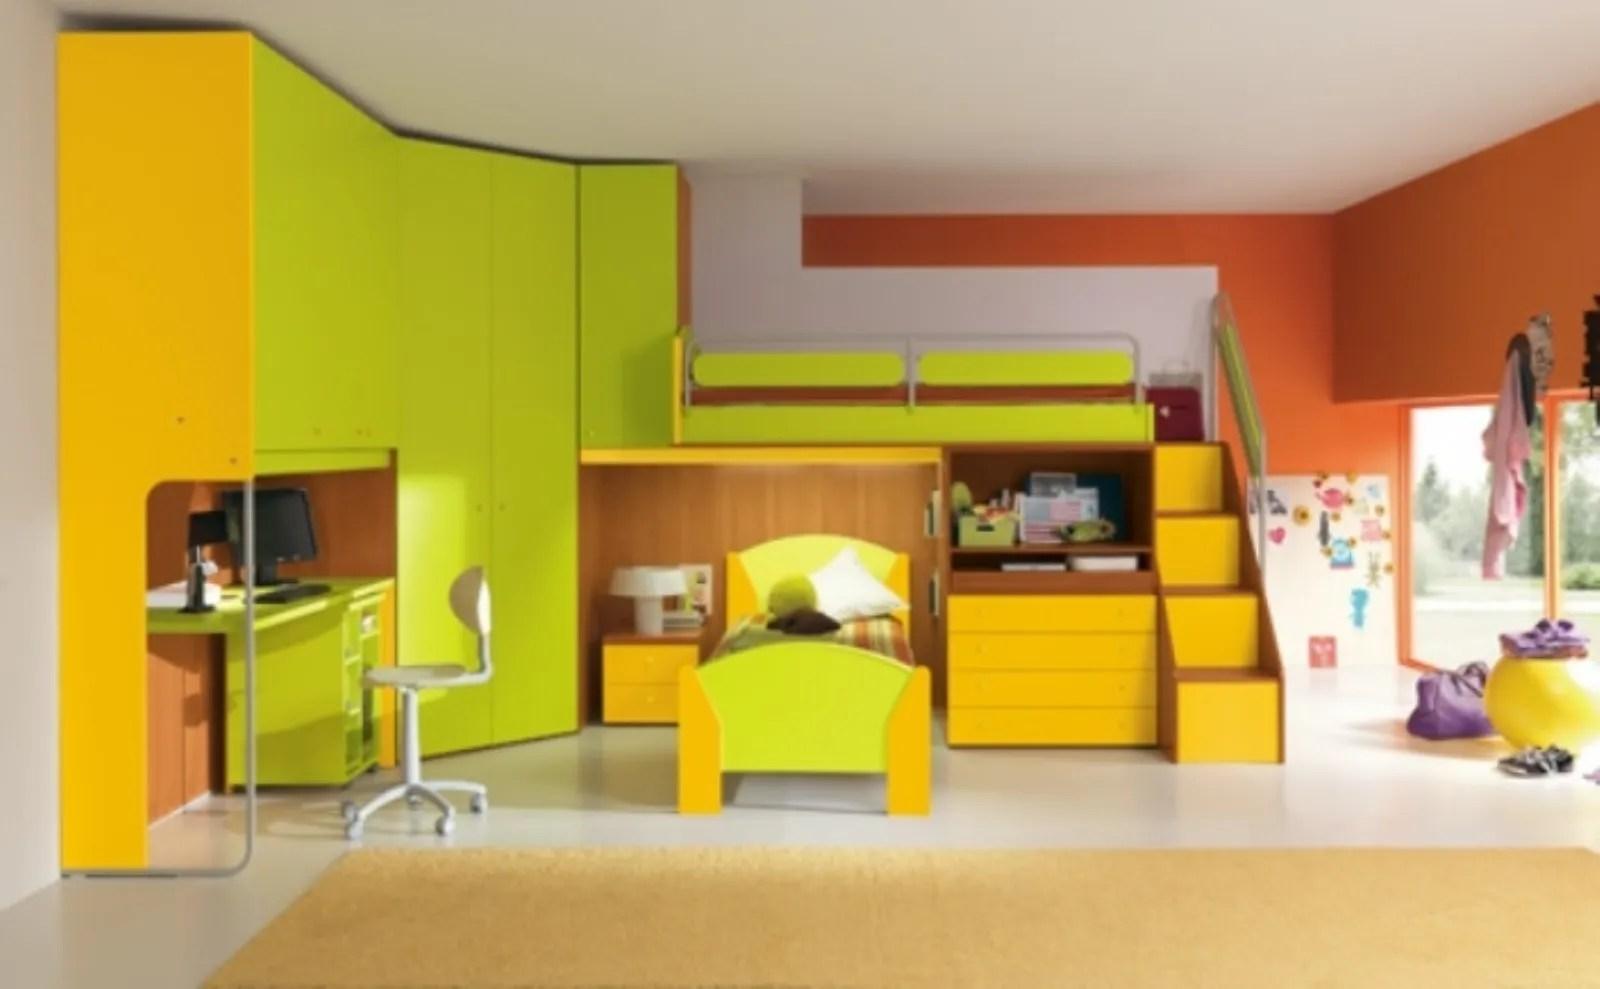 Lampadari foto layout mag, lampadari moderni for cucine divani colorates. Modelli Di Camerette Mercatone Uno